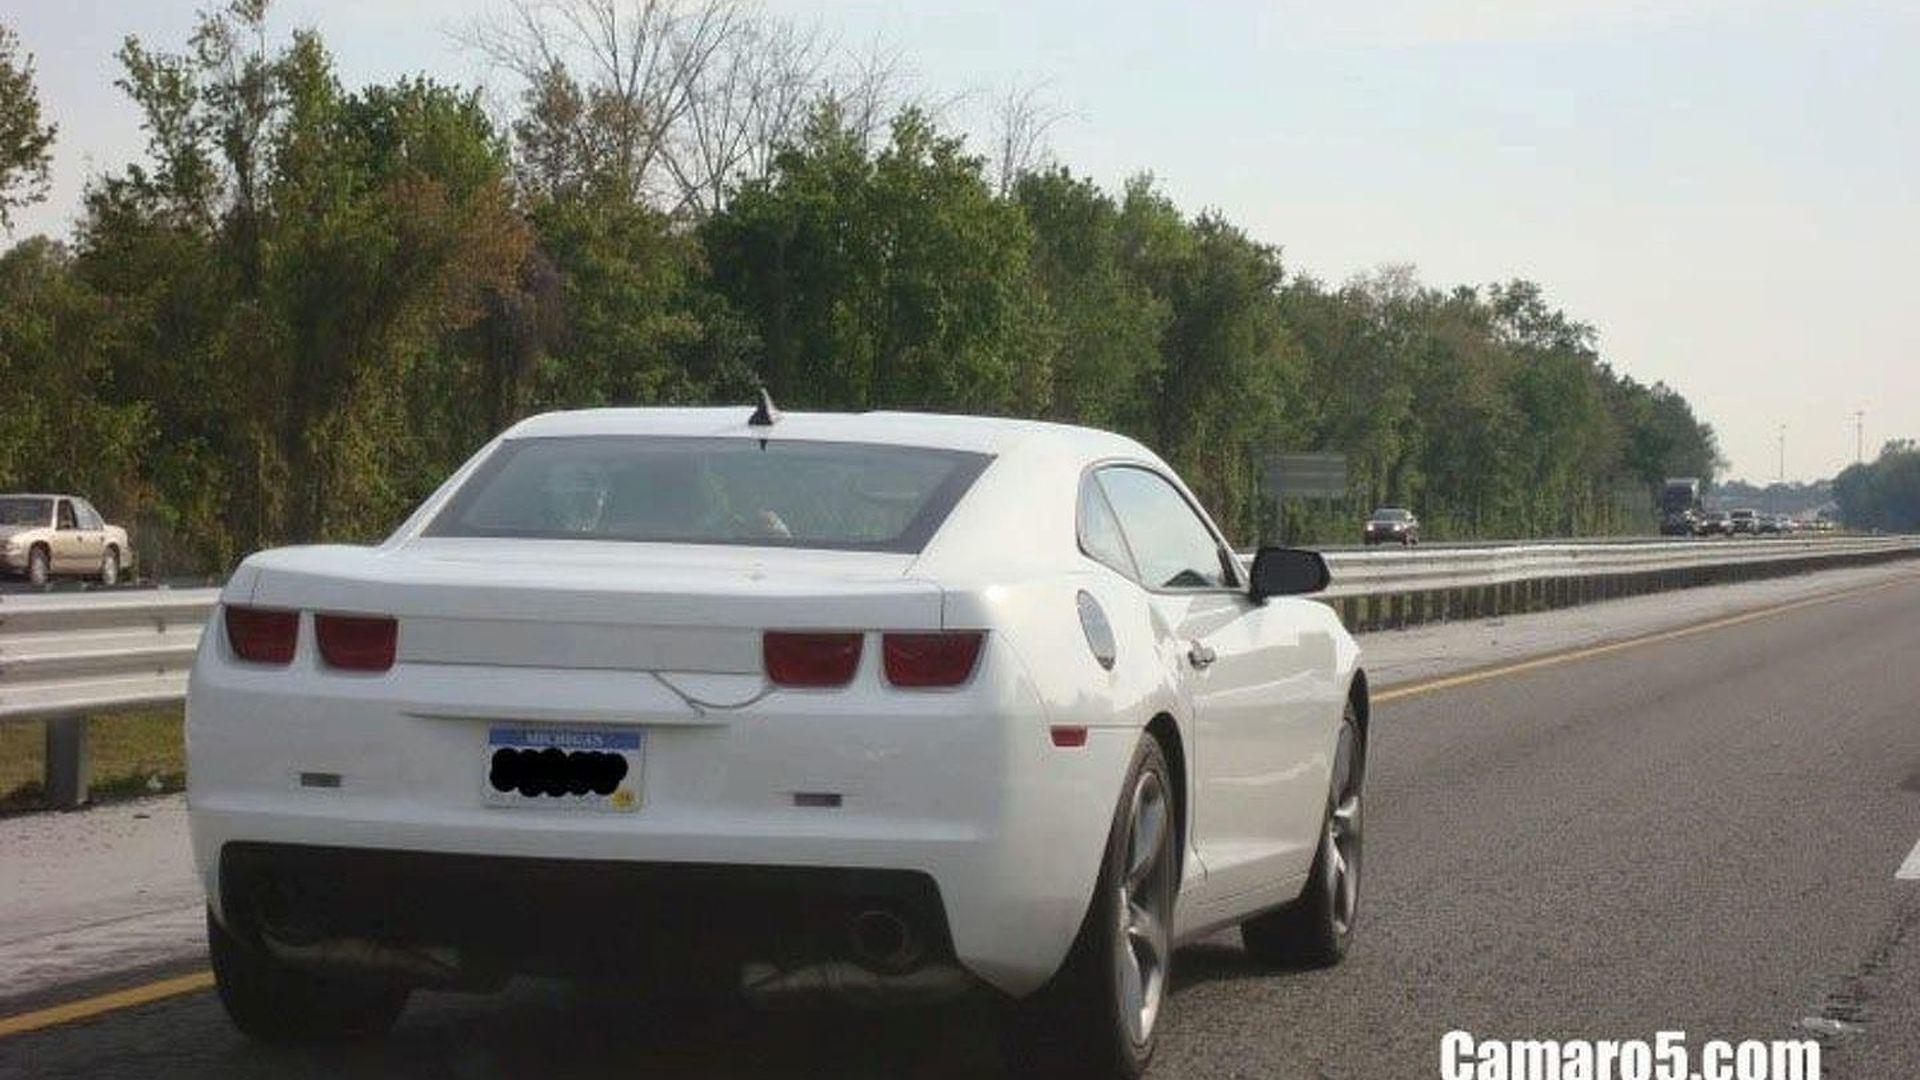 More Camaro spied in Florida